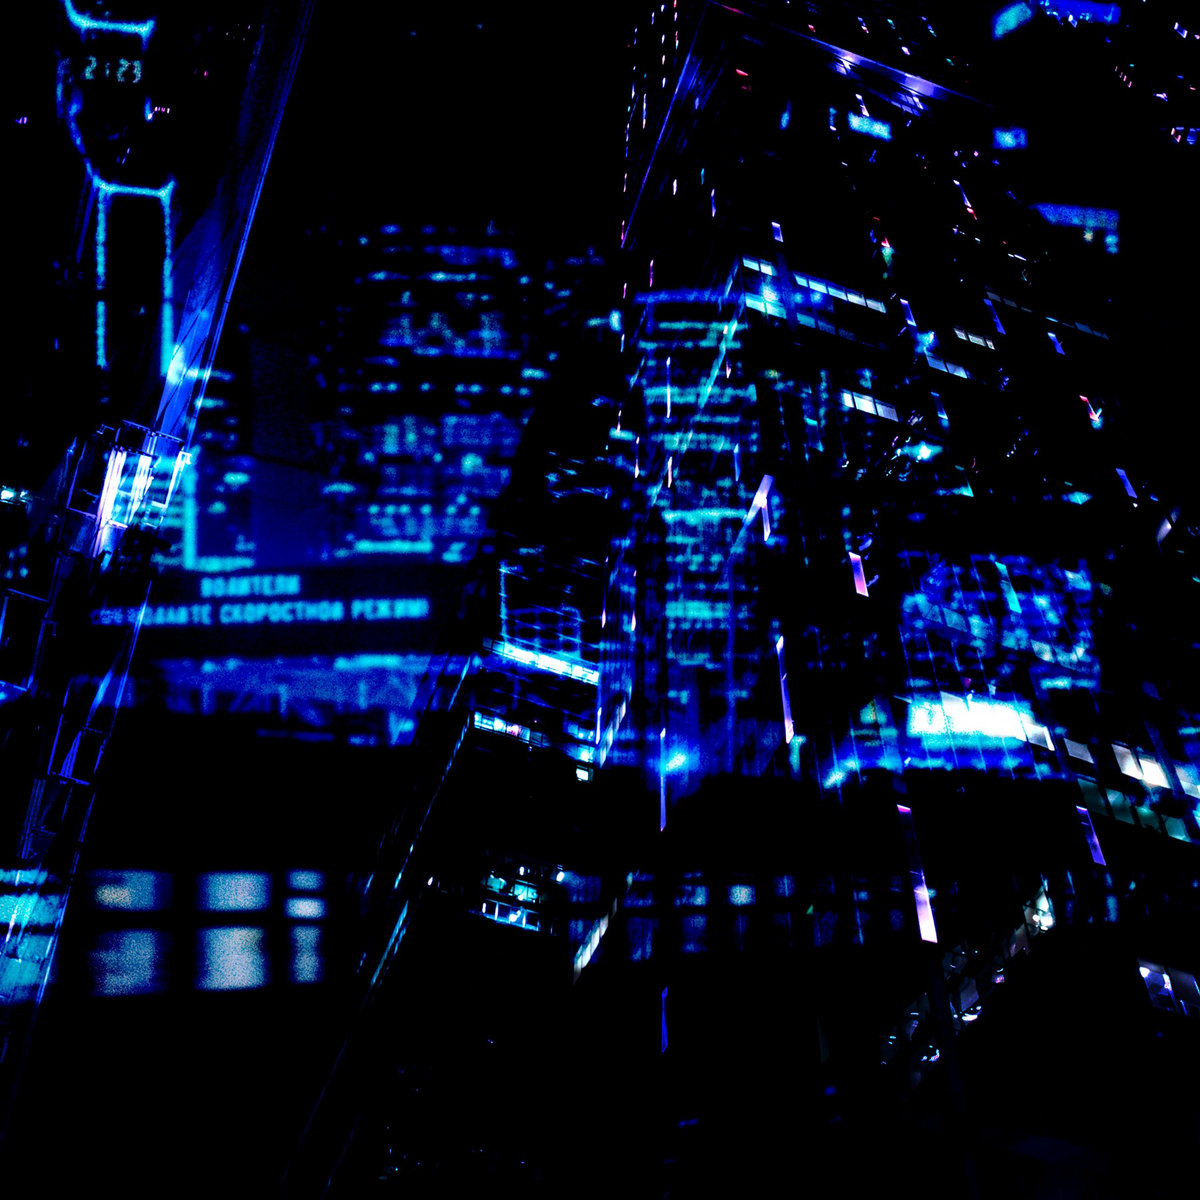 a0620289137 10 1 - CRYOSAUNA's 'Grid Failure' : Dark Synths and Dreampunk Bliss